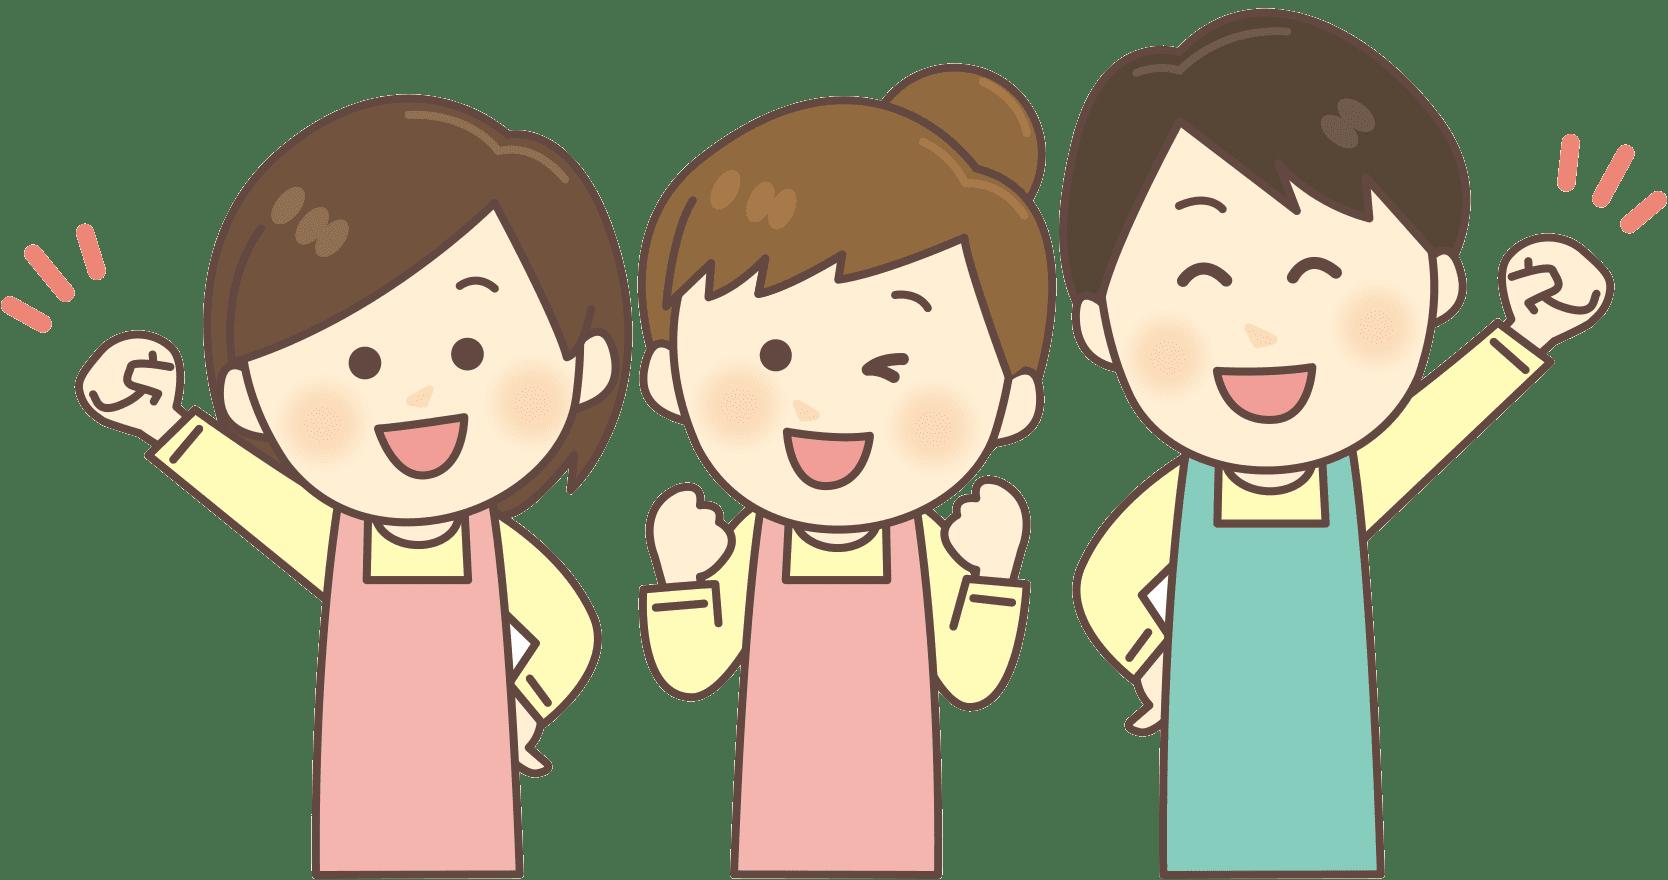 http://hokkaido-cs.com/files/libs/283/20180118153410897.png